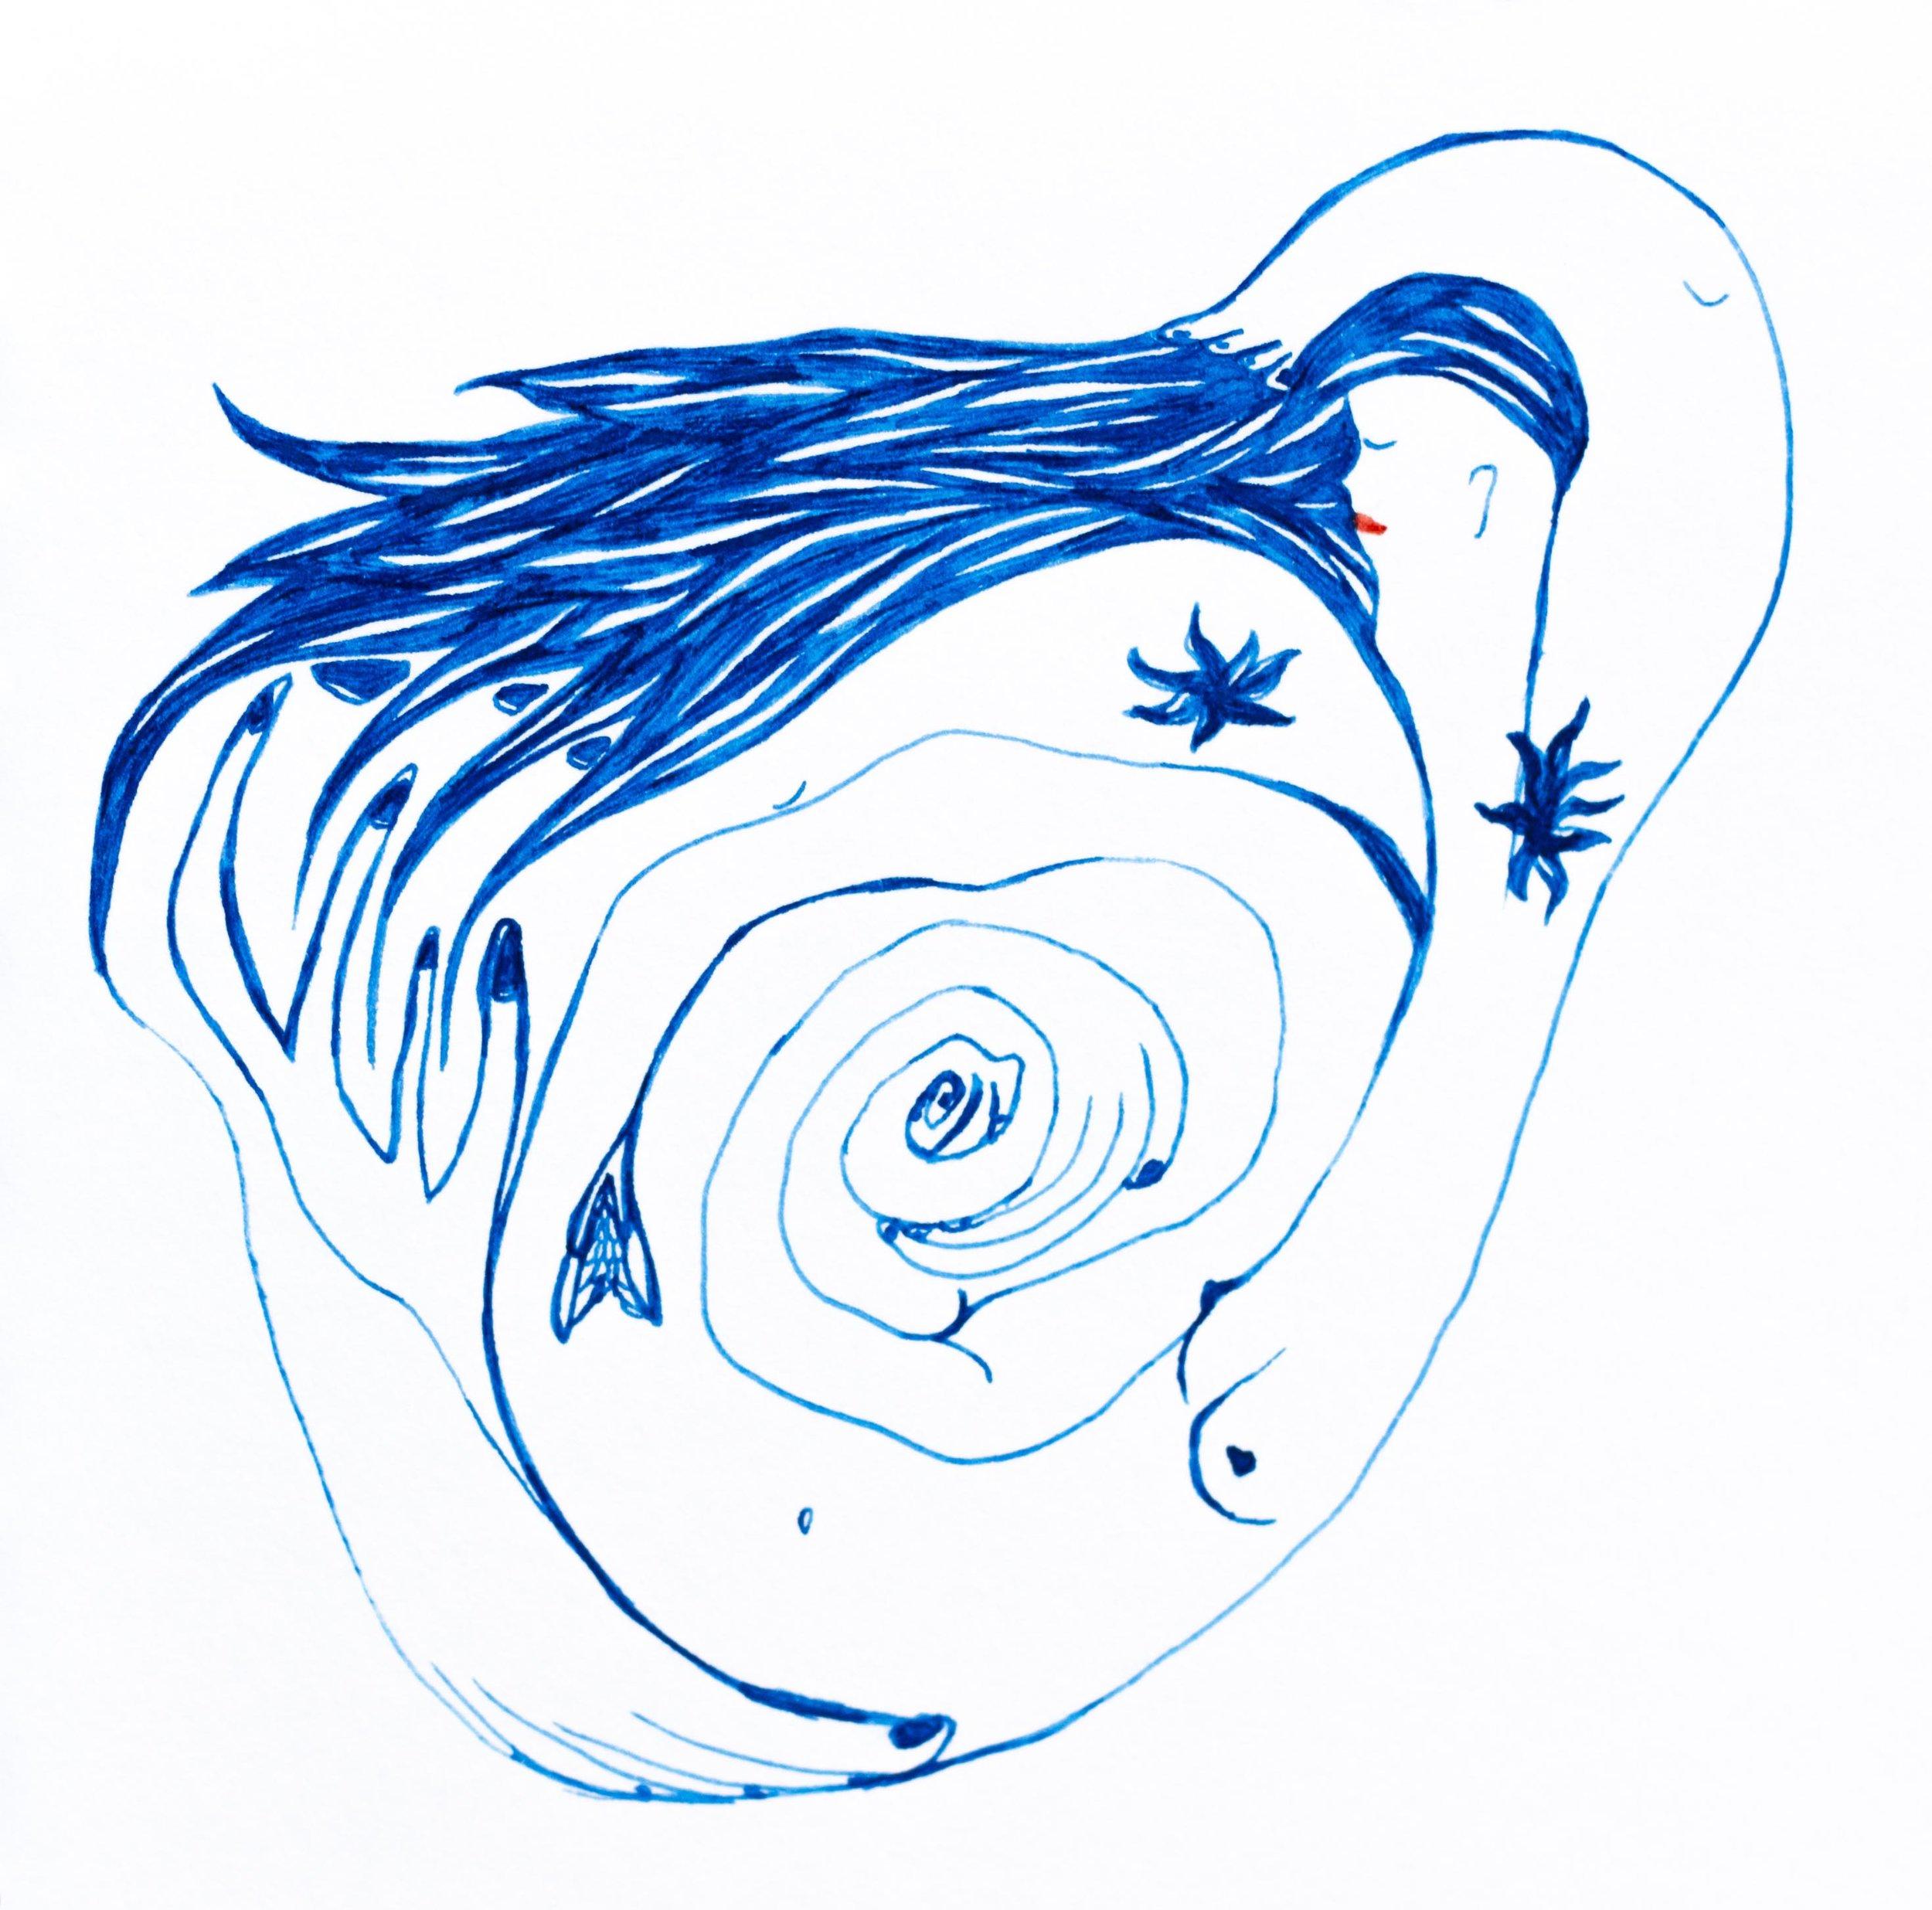 spiral-woman-miesueel.jpg